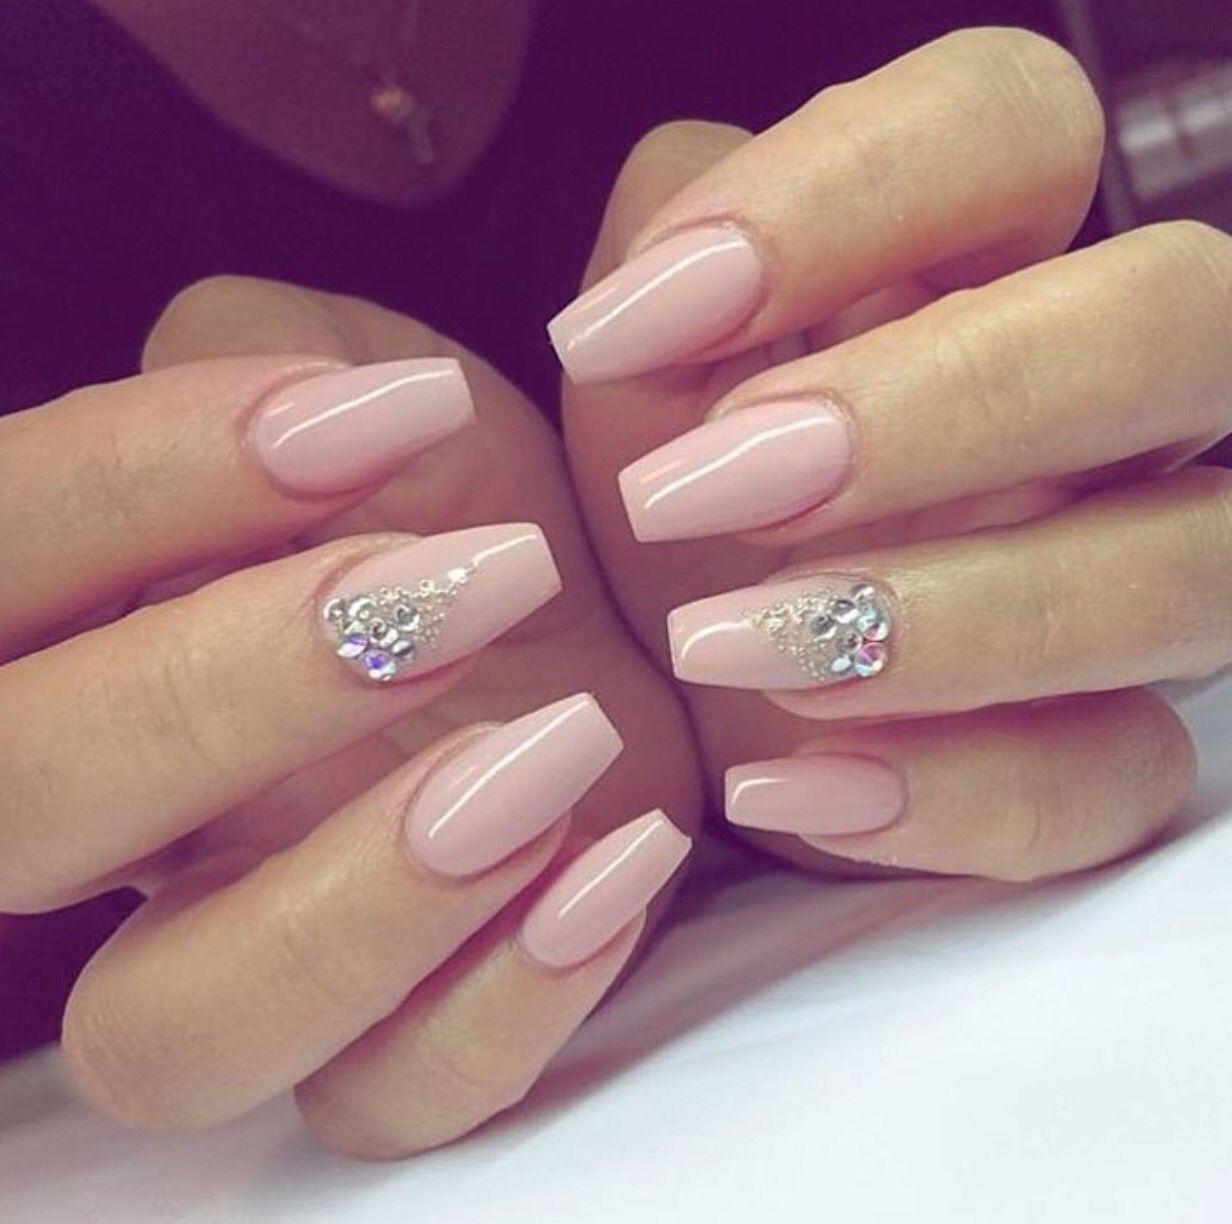 Light Pink Gel Nails With Design